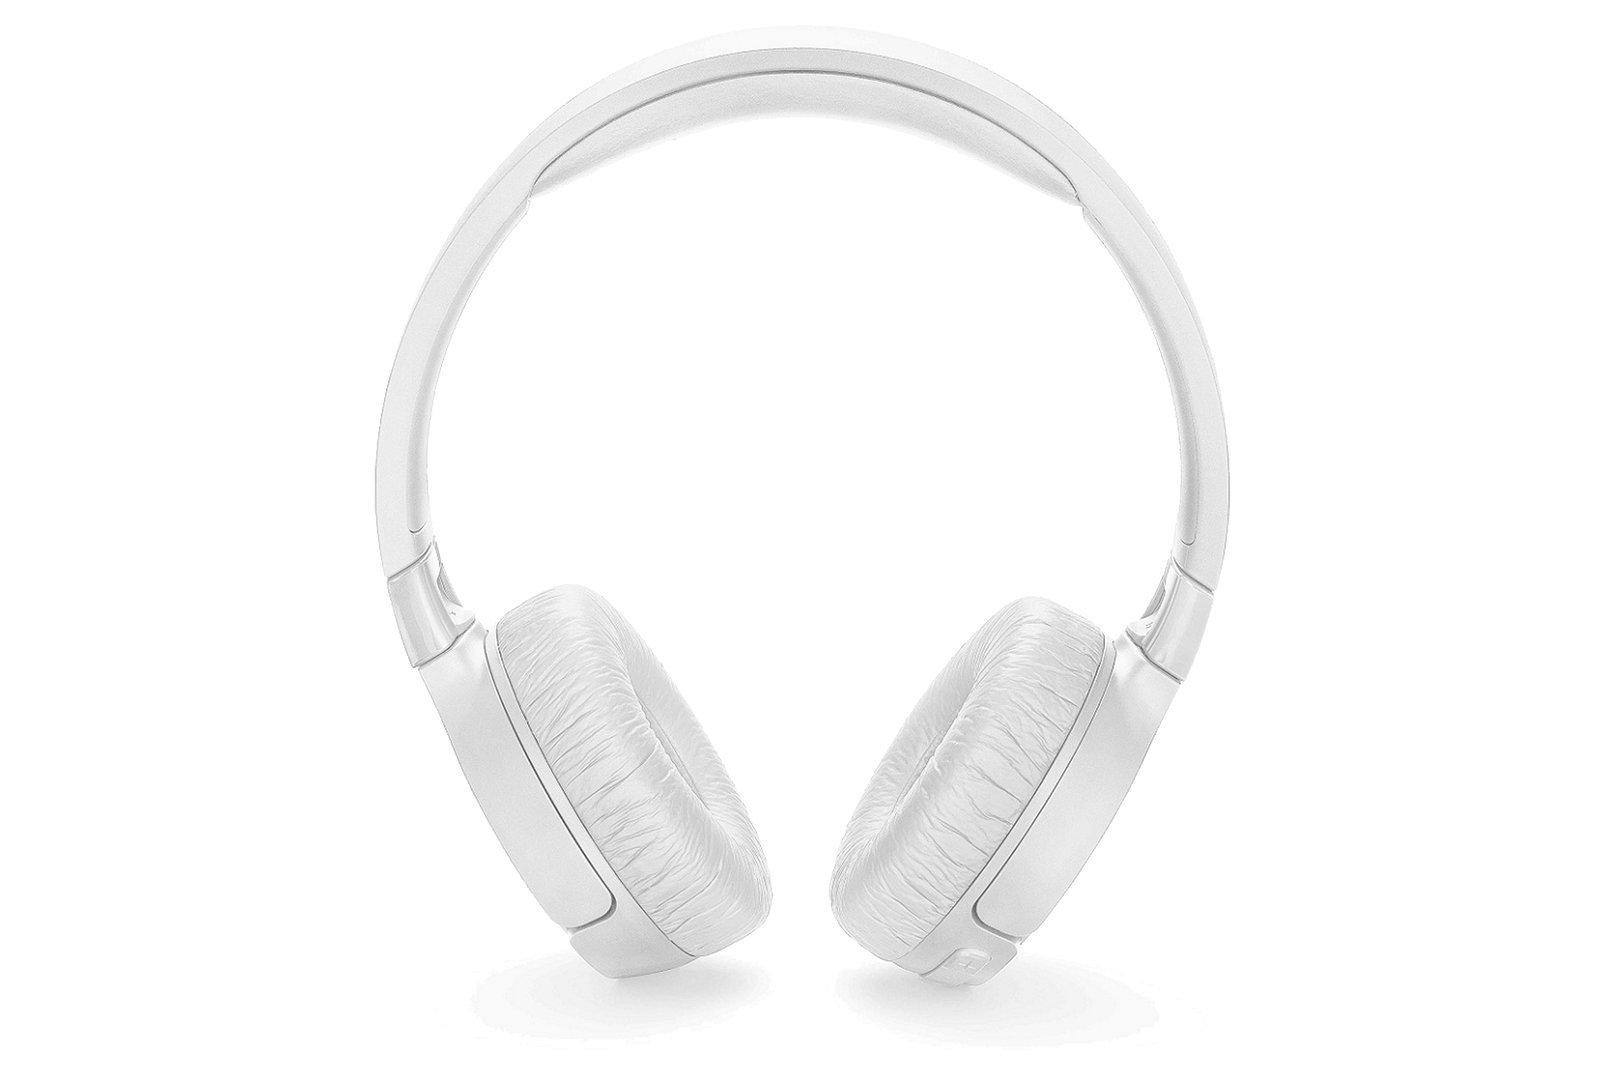 New Wireless Over-ear Noise-cancelling Headphones JBL 600BTNC TUNE600BTNC White